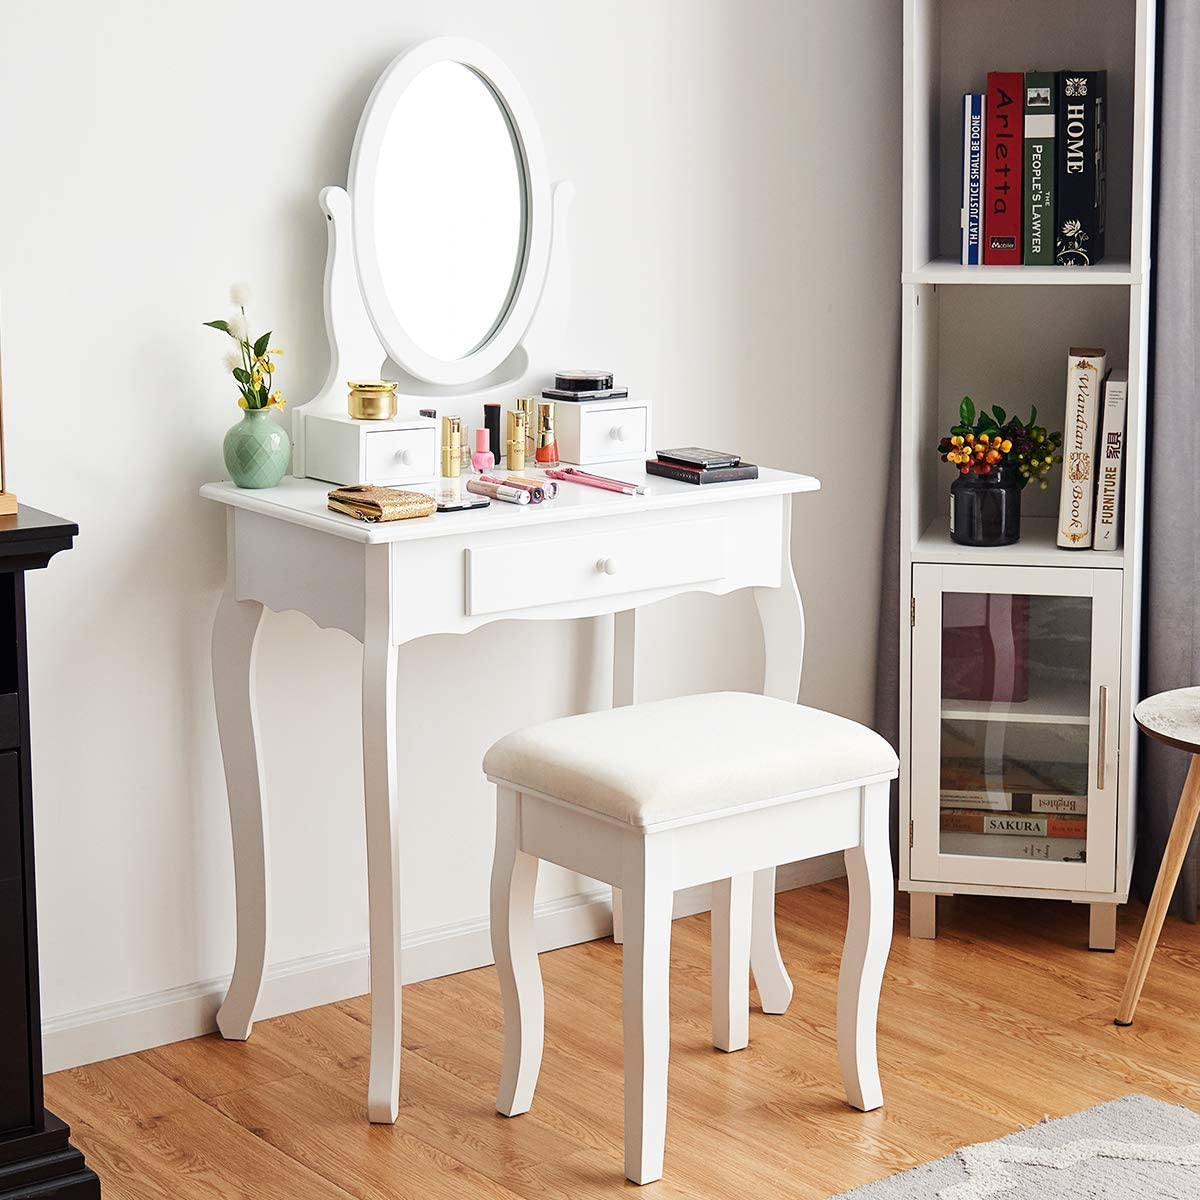 Giantex Vanity Table Set 20 Drawers with Mirror, Cushioned Bench Bathroom  Bedroom Wood Room Vanities Removable Top Dual Use Jewelry Makeup Dresser